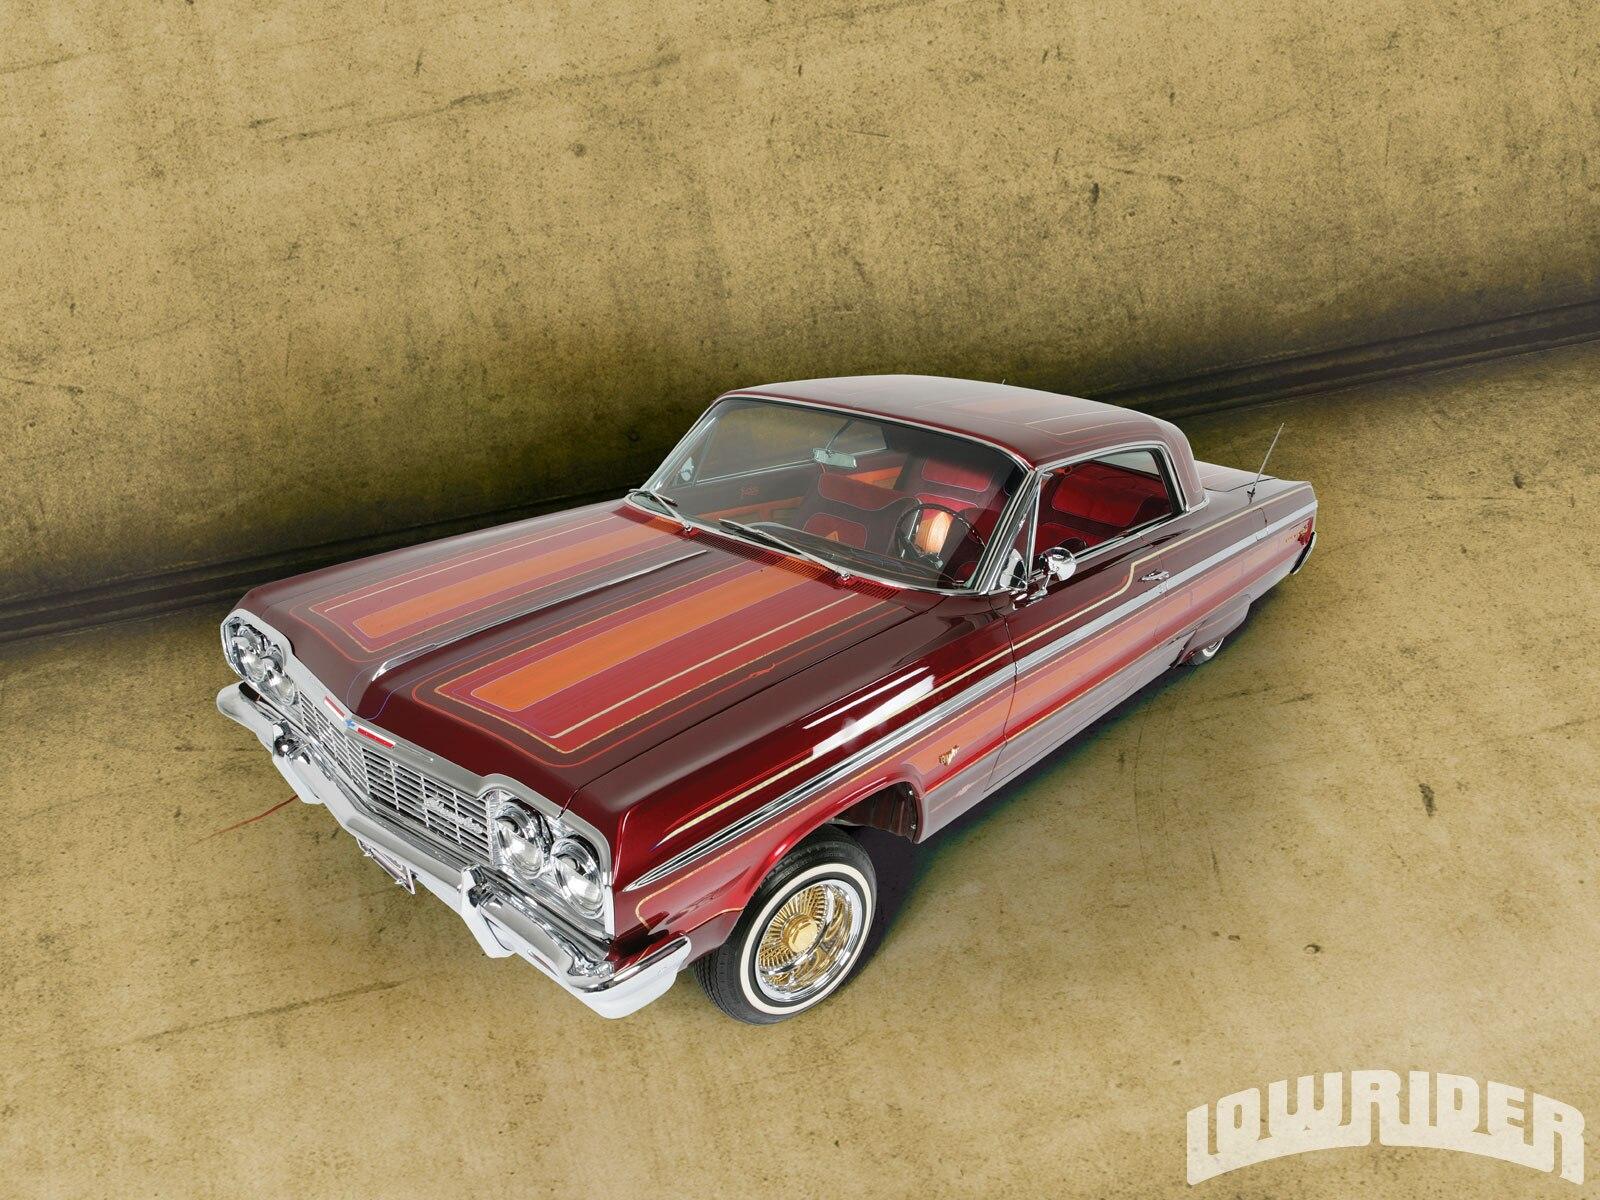 1102-lrmp-02-o-1964-chevrolet-impala-driver-side-front2